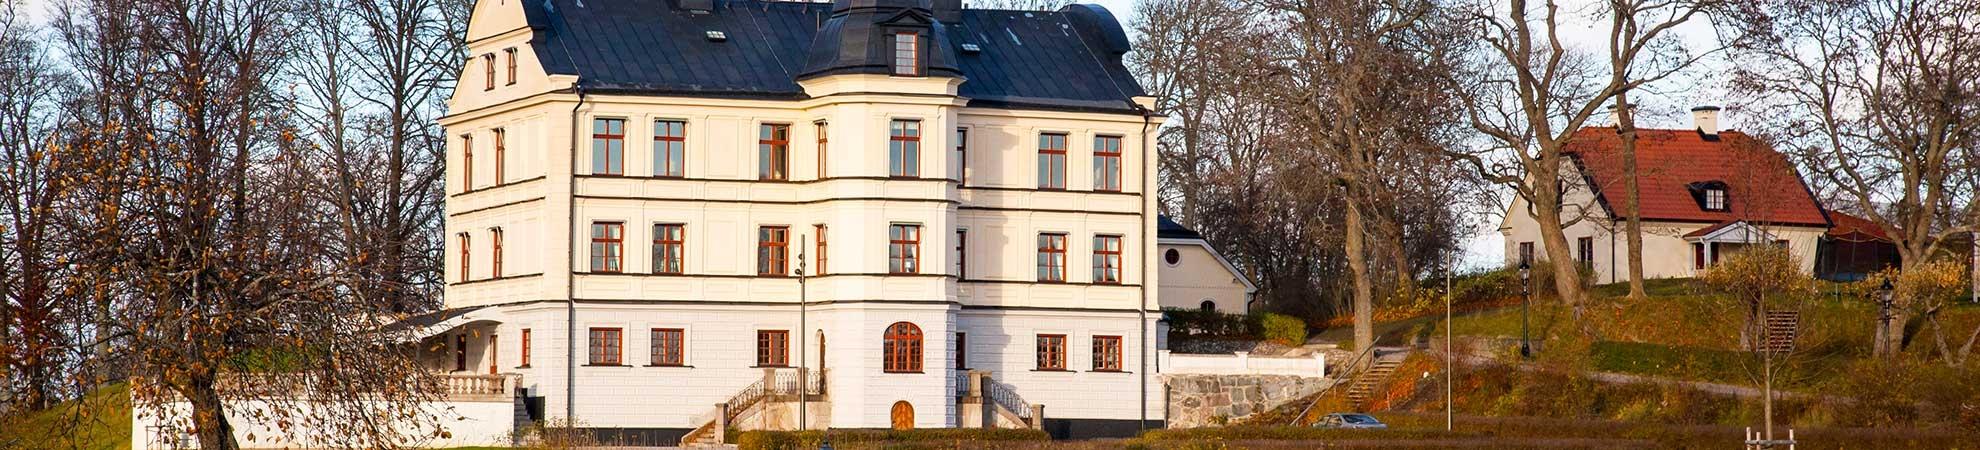 Hôtels 4 étoiles Scandinavie